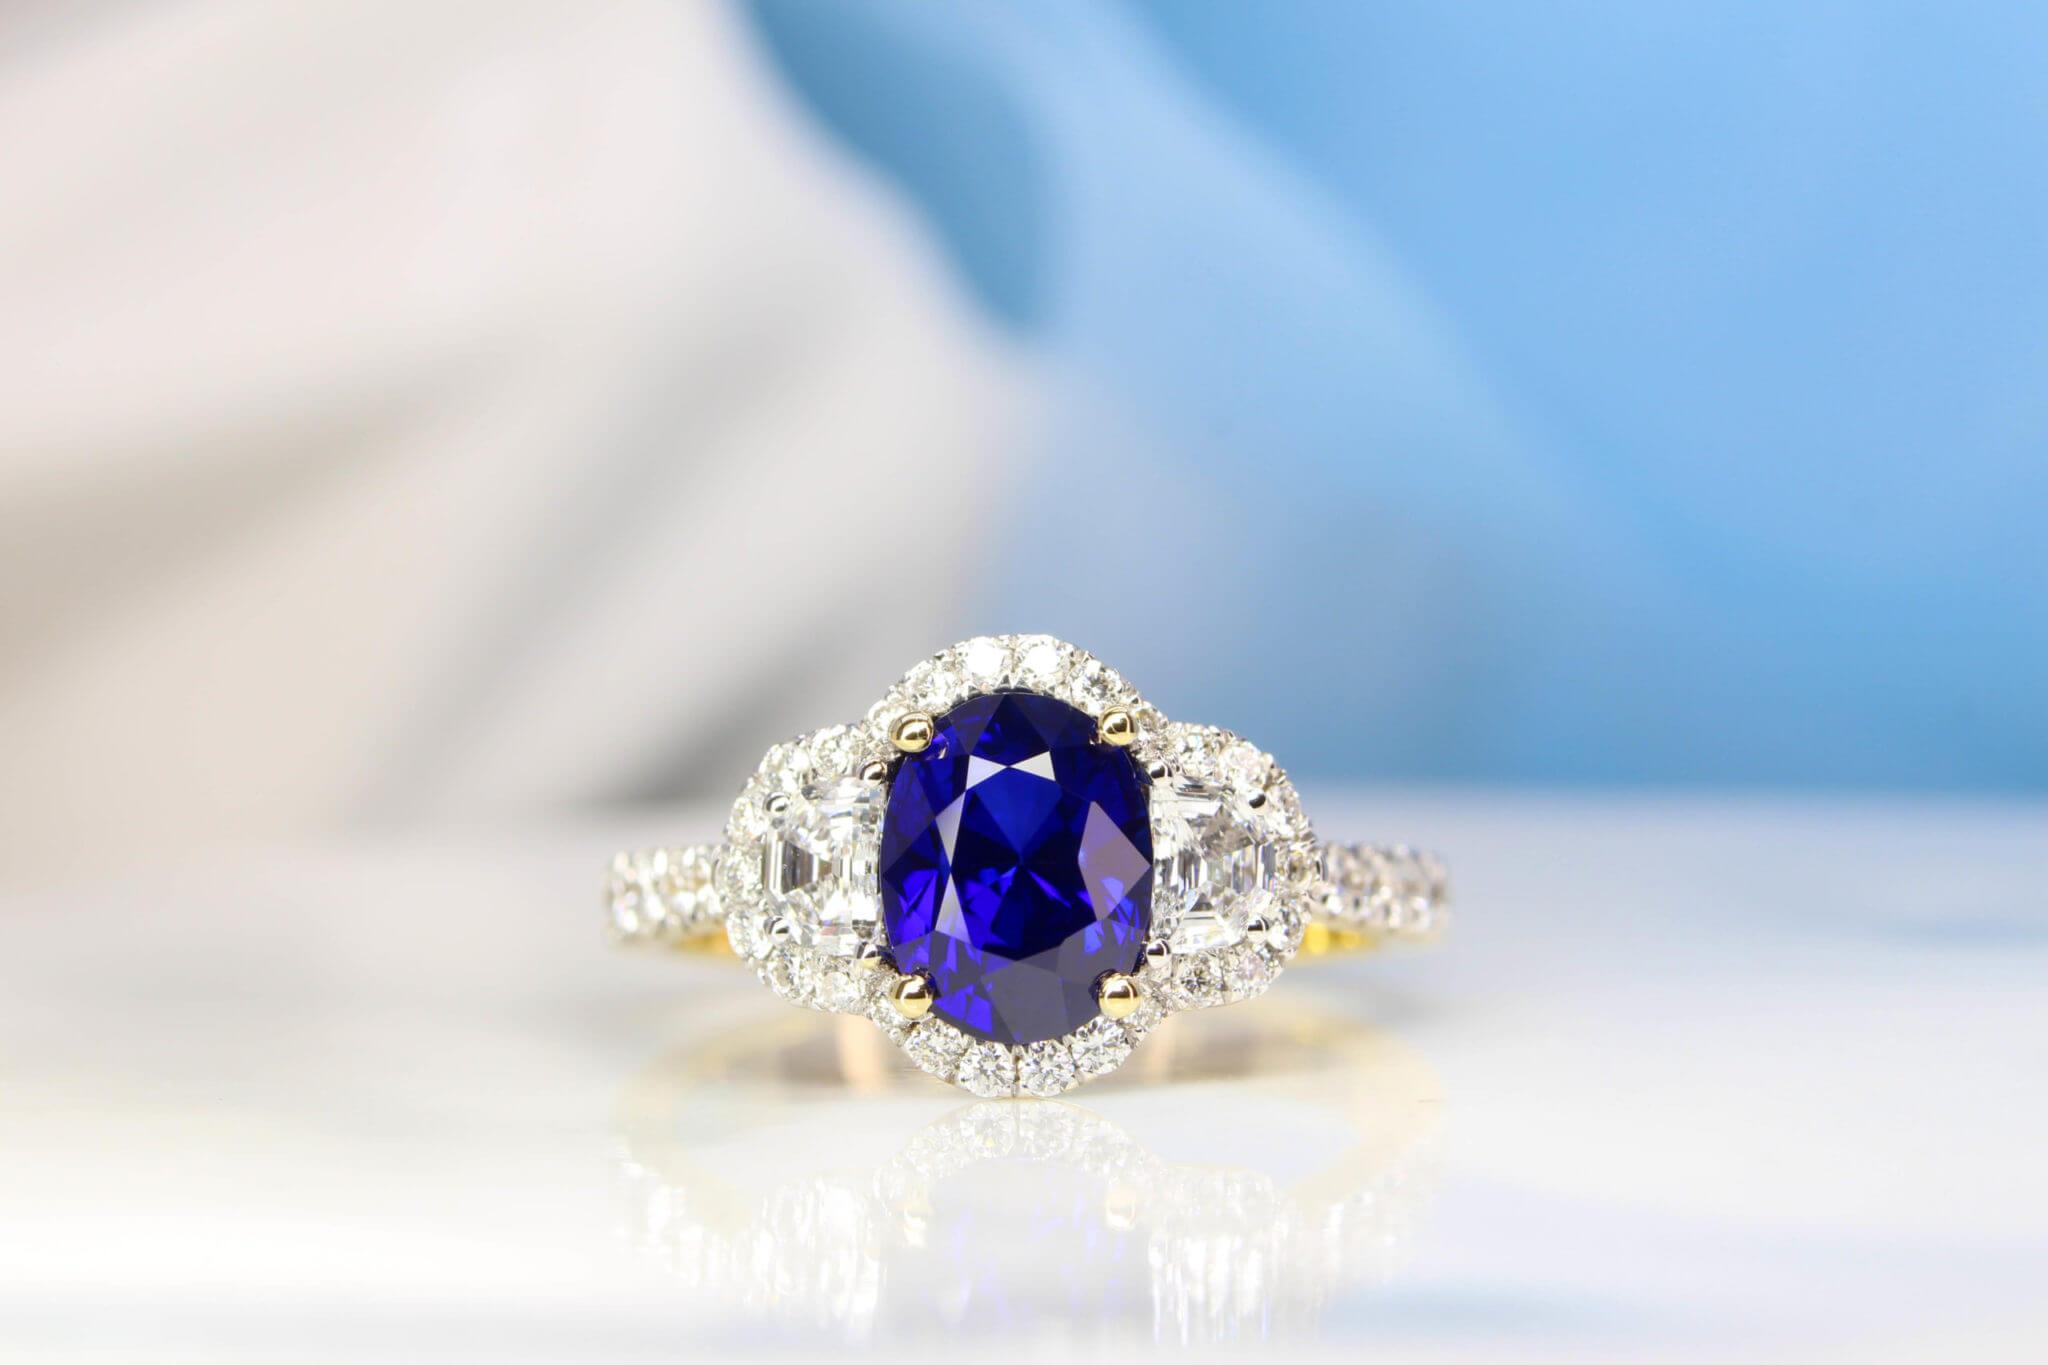 Royal Blue Sapphire with halfmoon and halo diamond ring